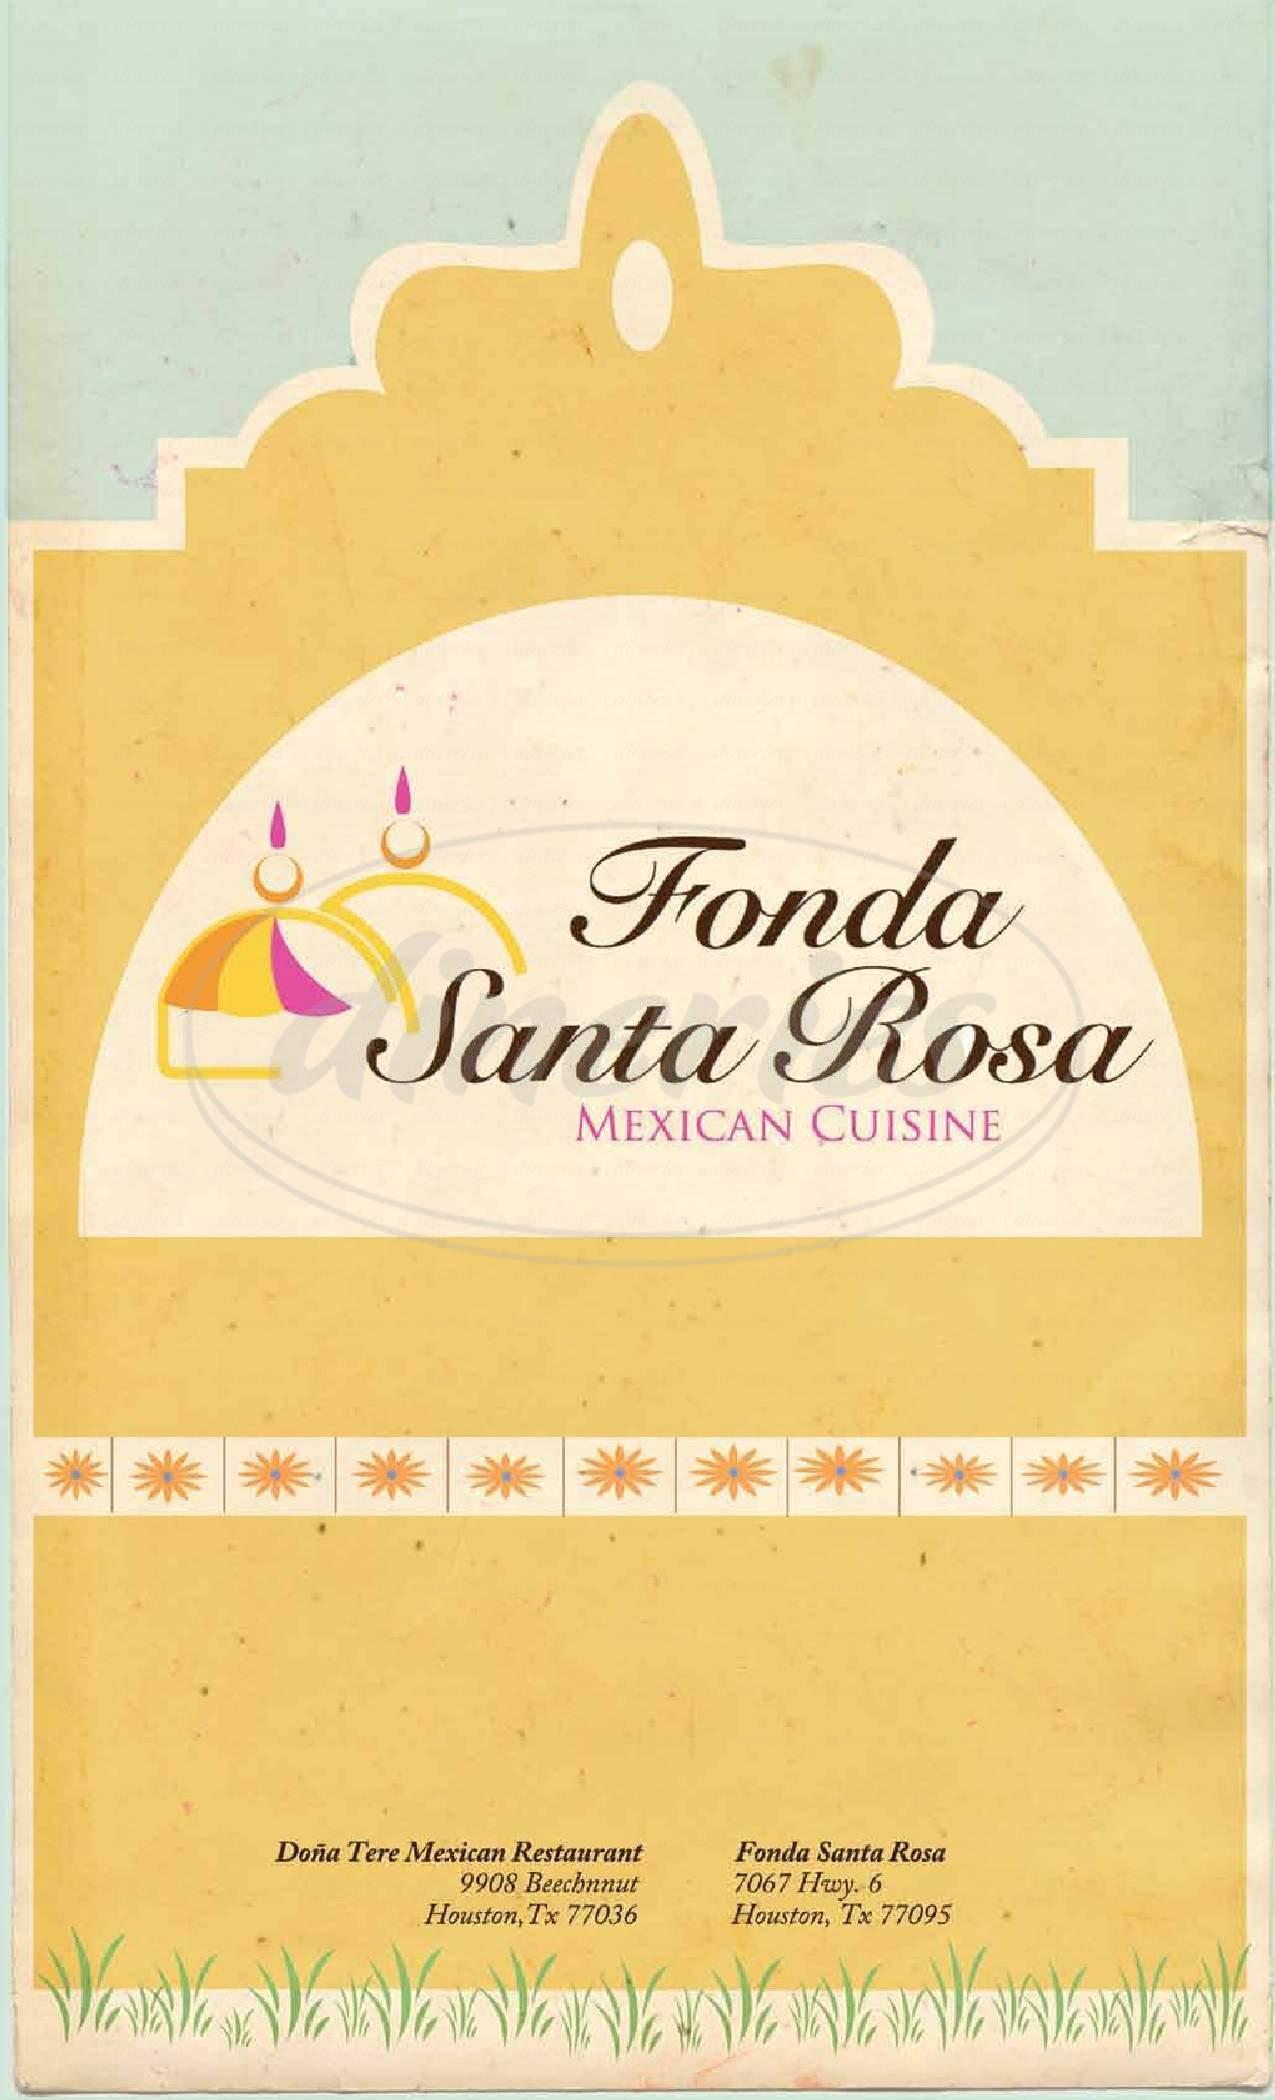 menu for Fonda Santa Rosa